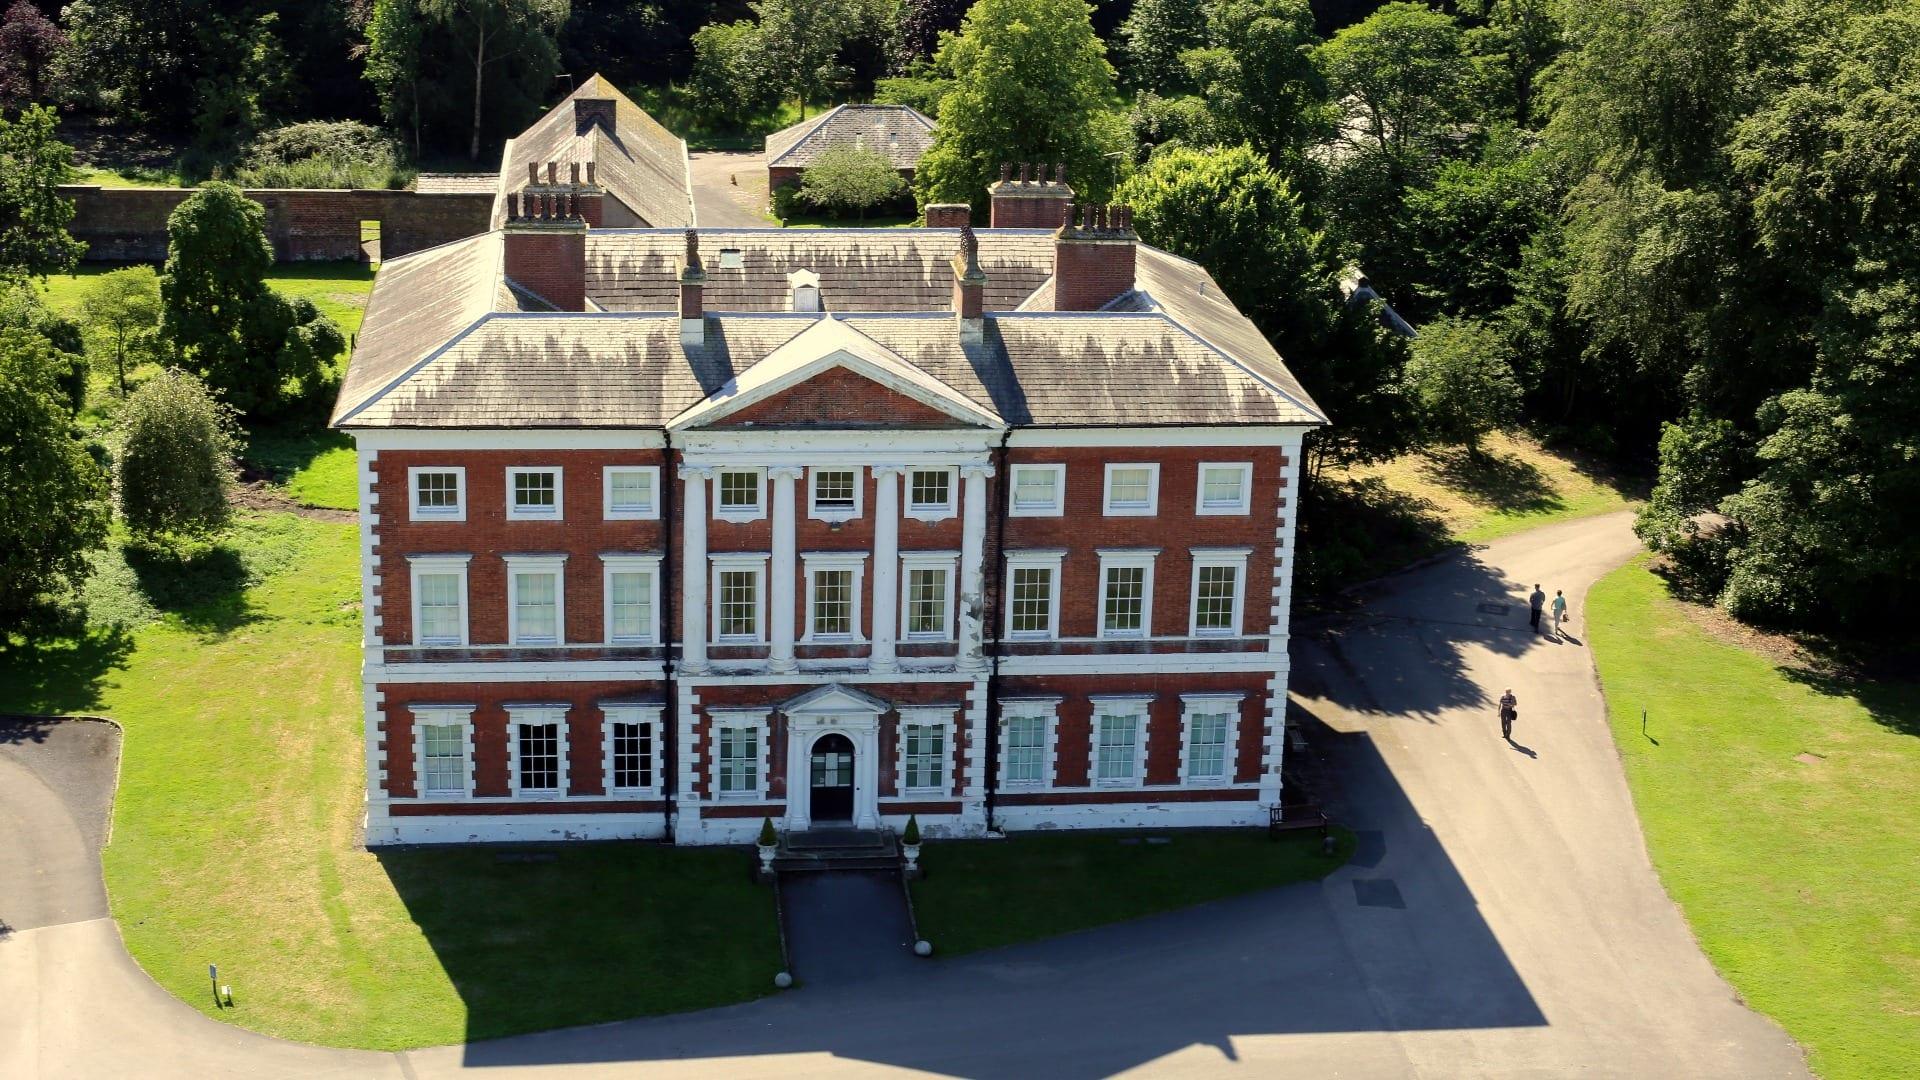 Aerial view of Lytham Hall